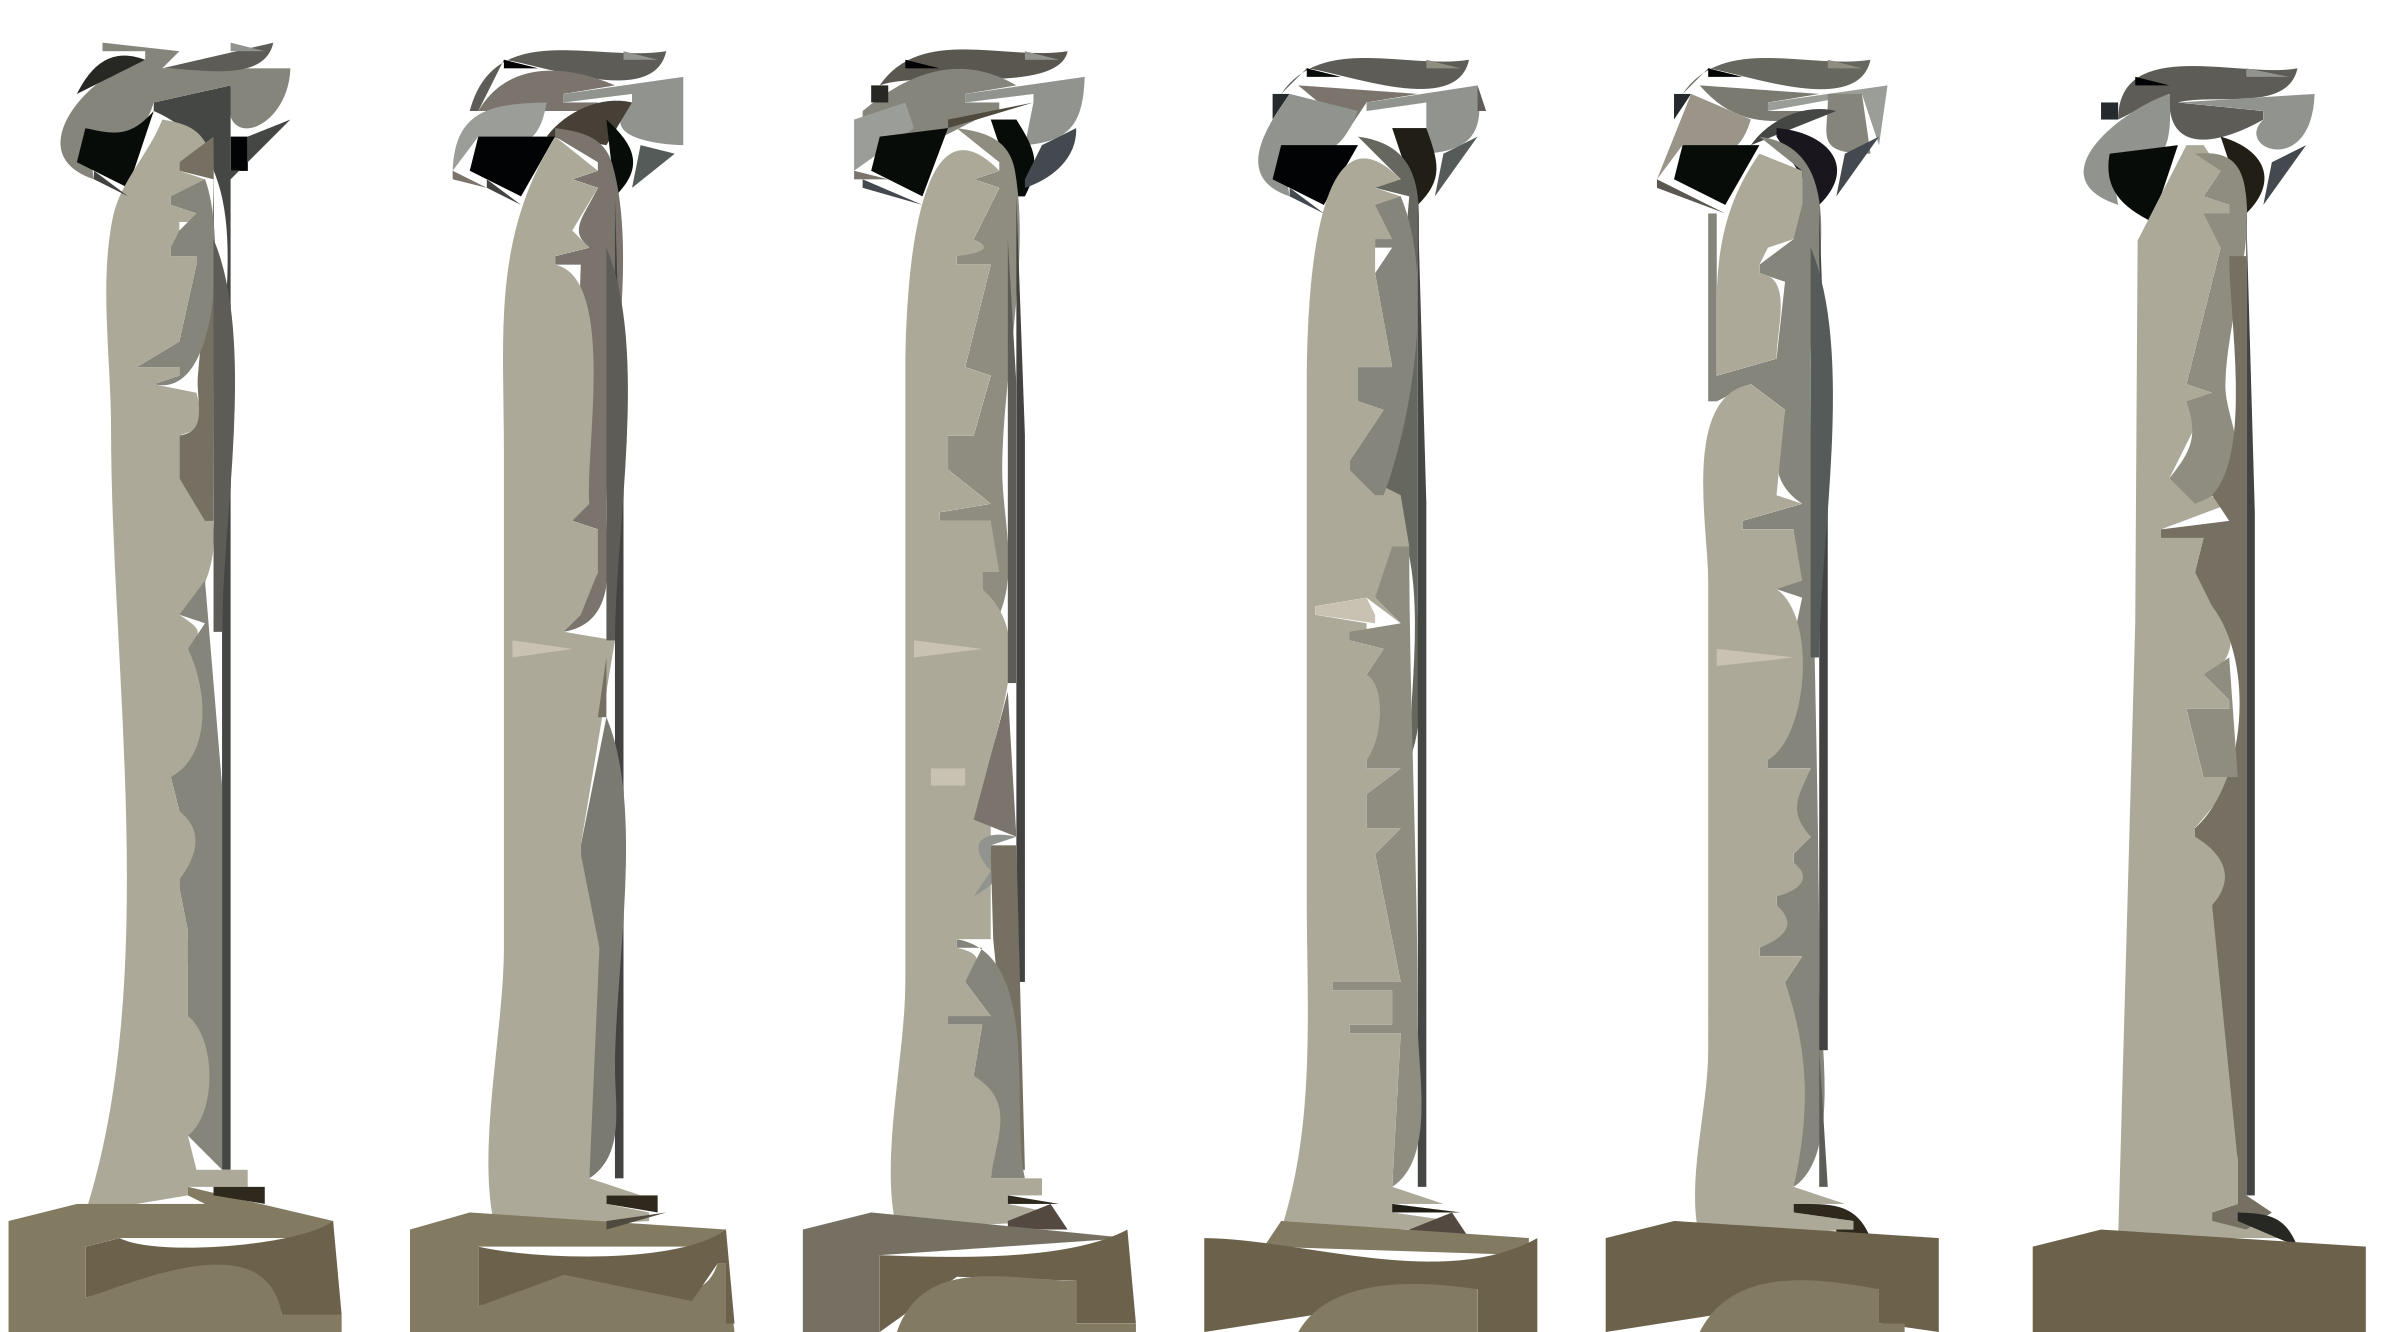 Column clipart pillers. Missouri columns icons png